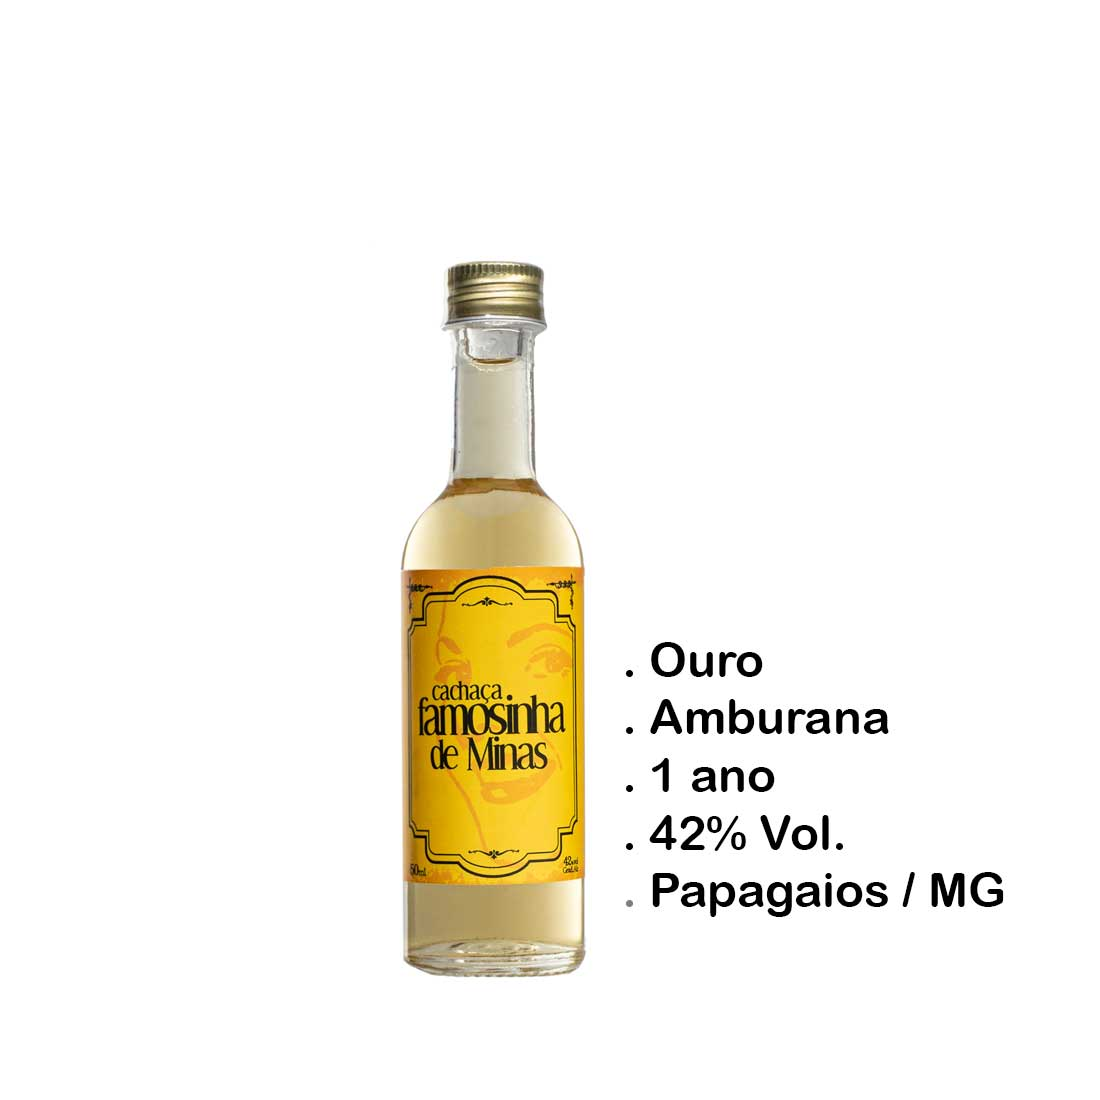 Cachaça Famosinha de Minas 50 ml (Papagaios - MG)